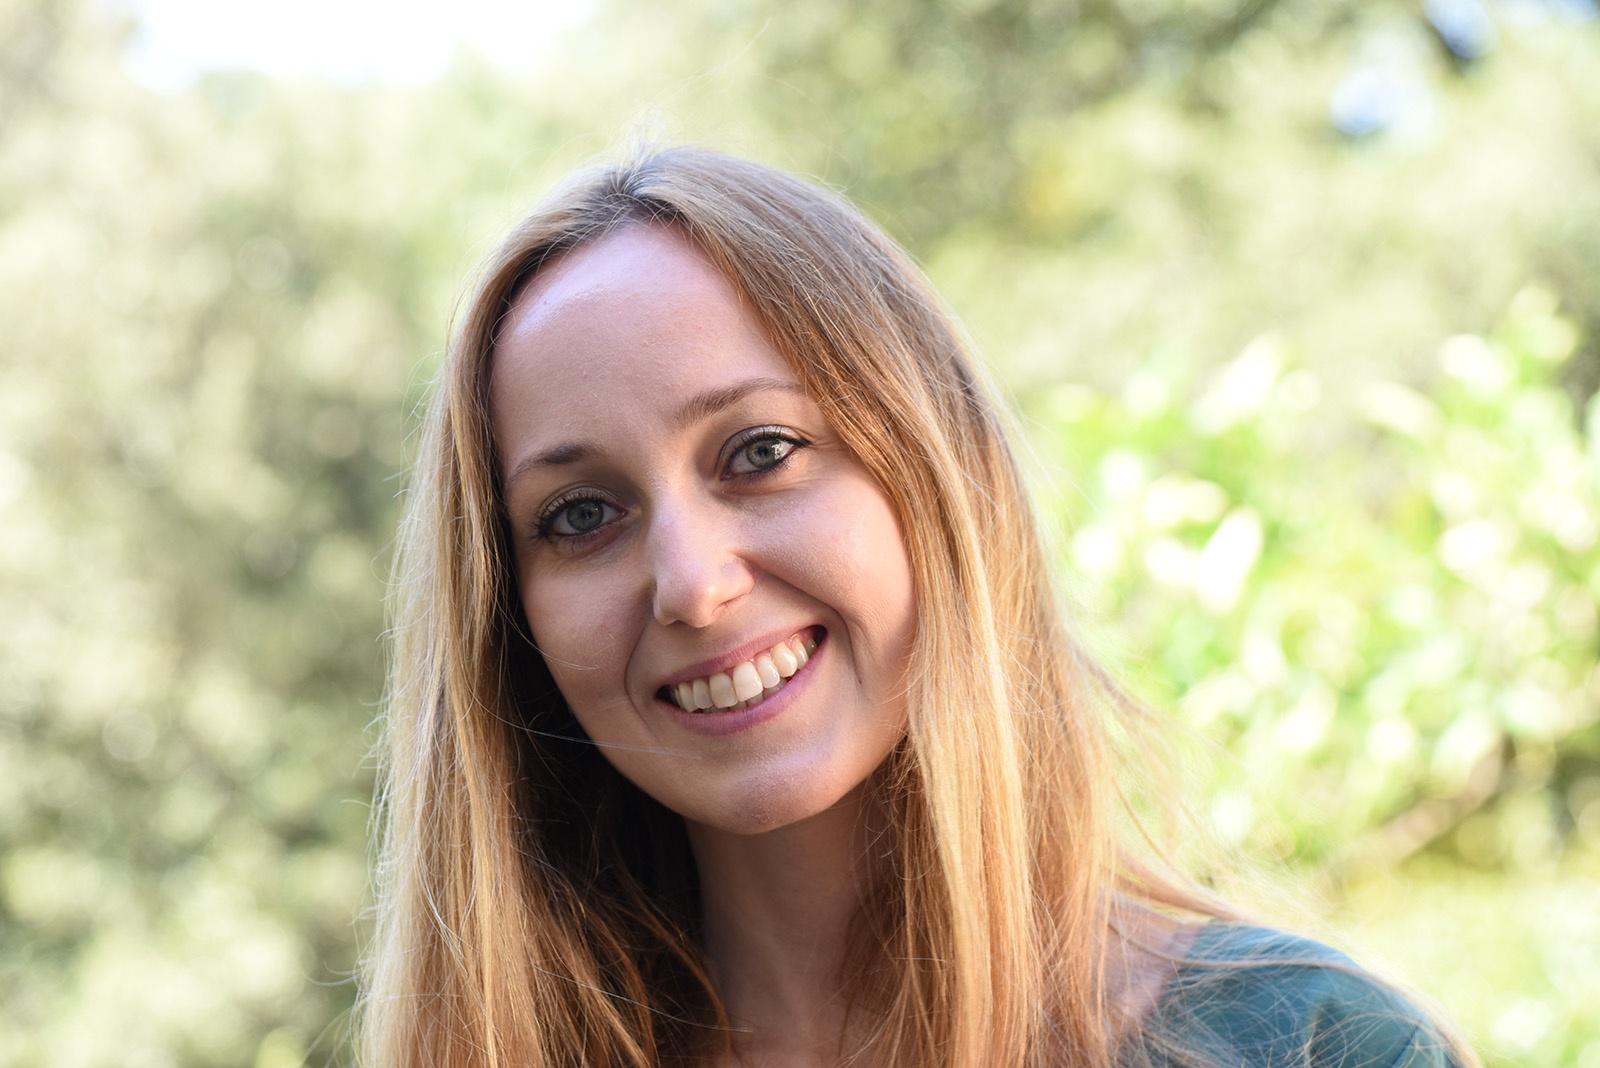 Portrait photo of Alessia Bellusci